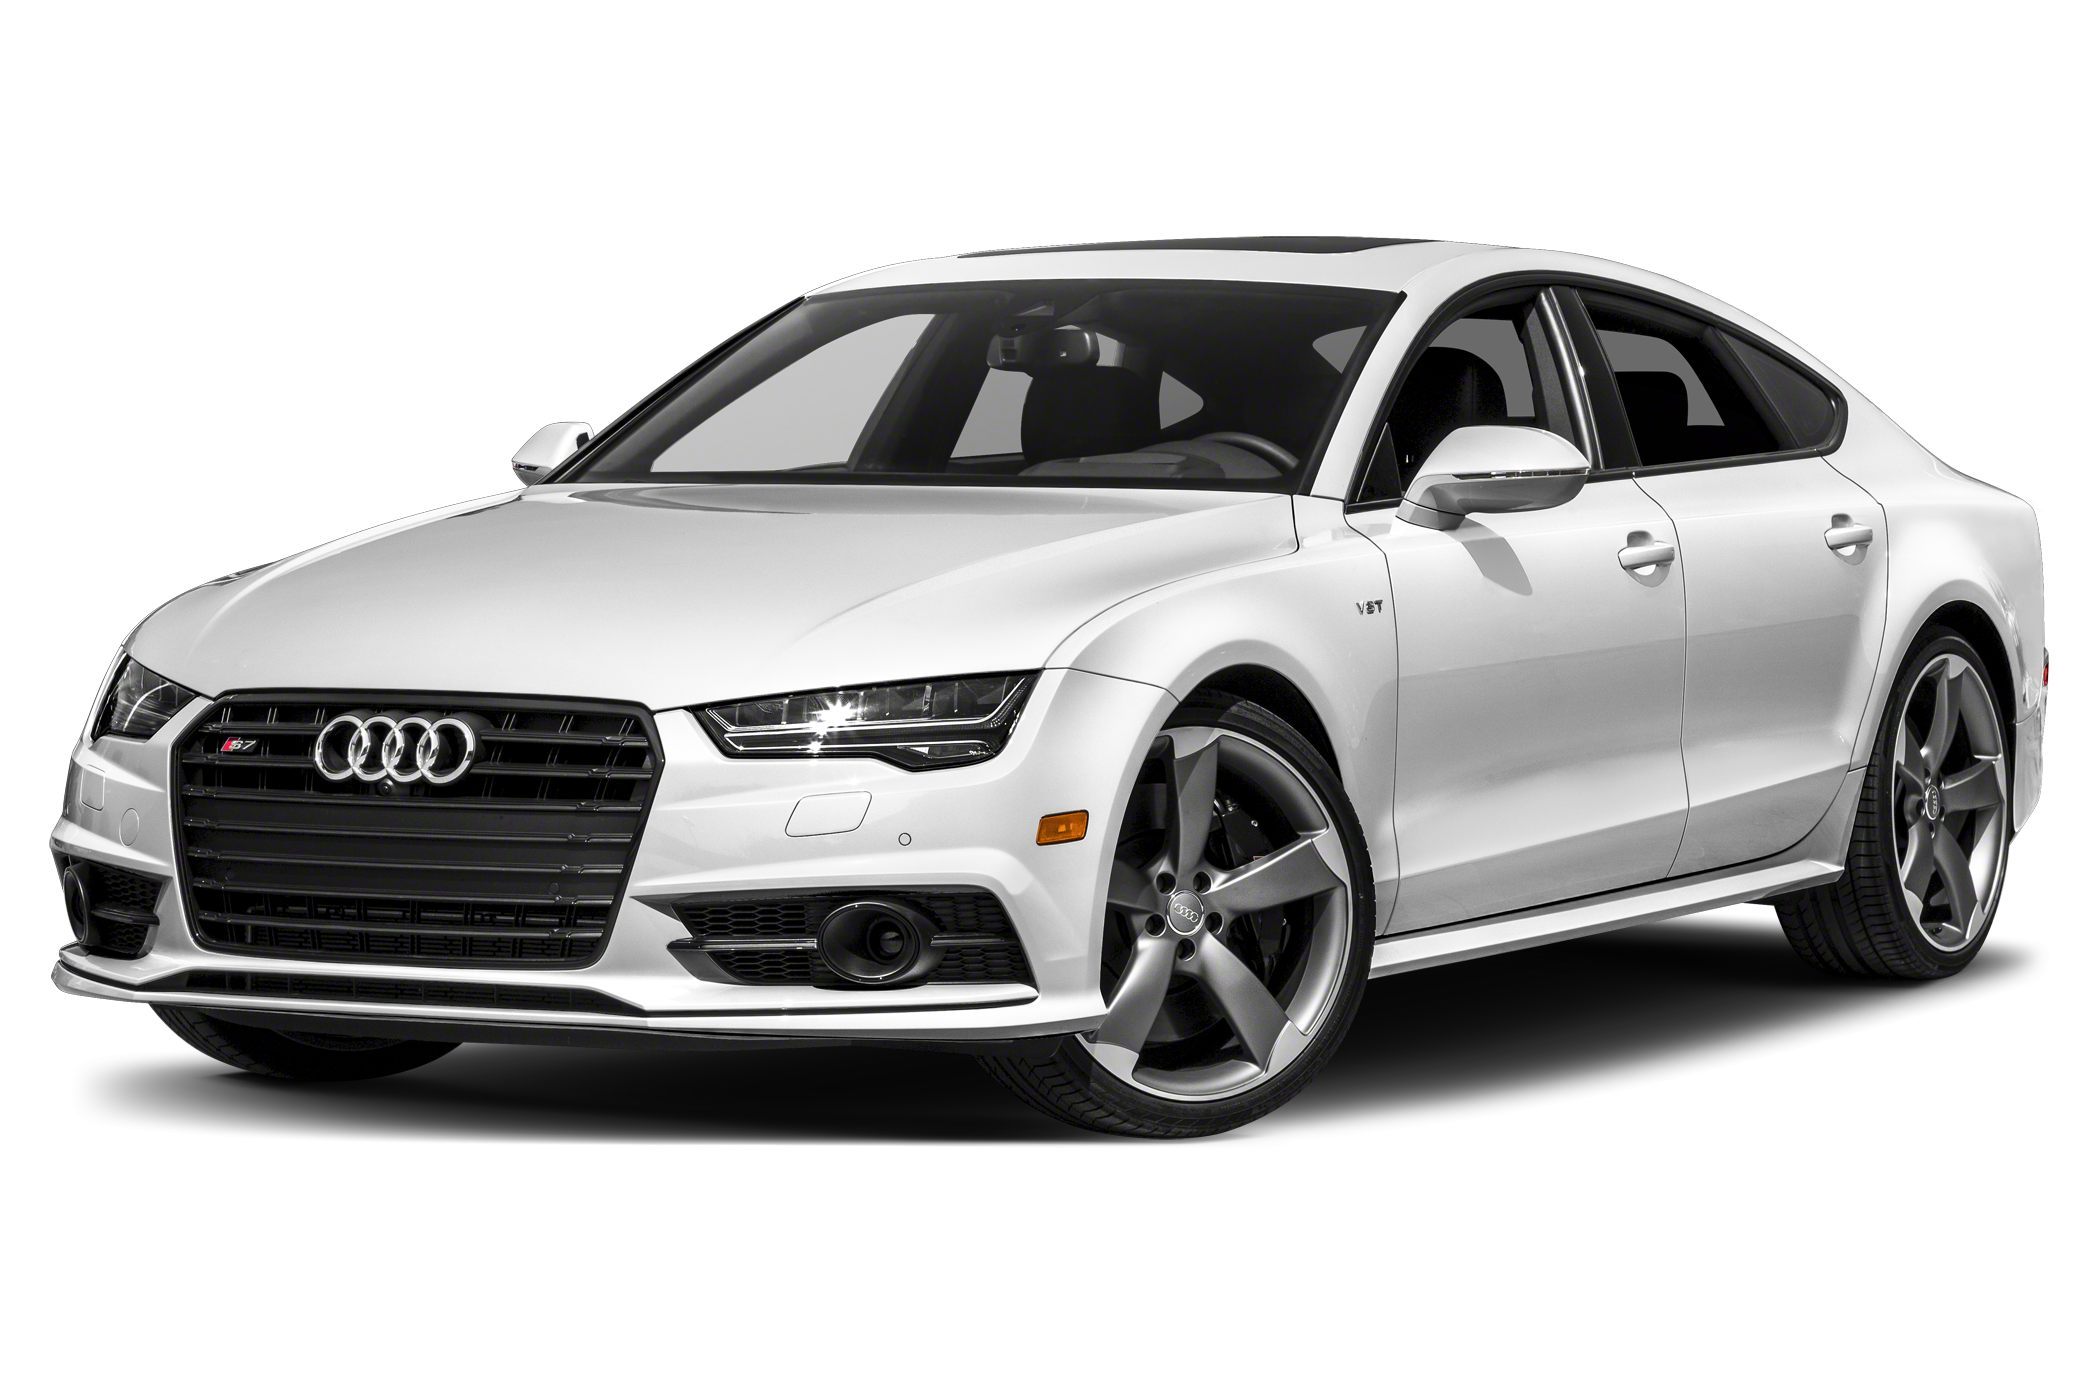 Kekurangan Audi 2017 Tangguh